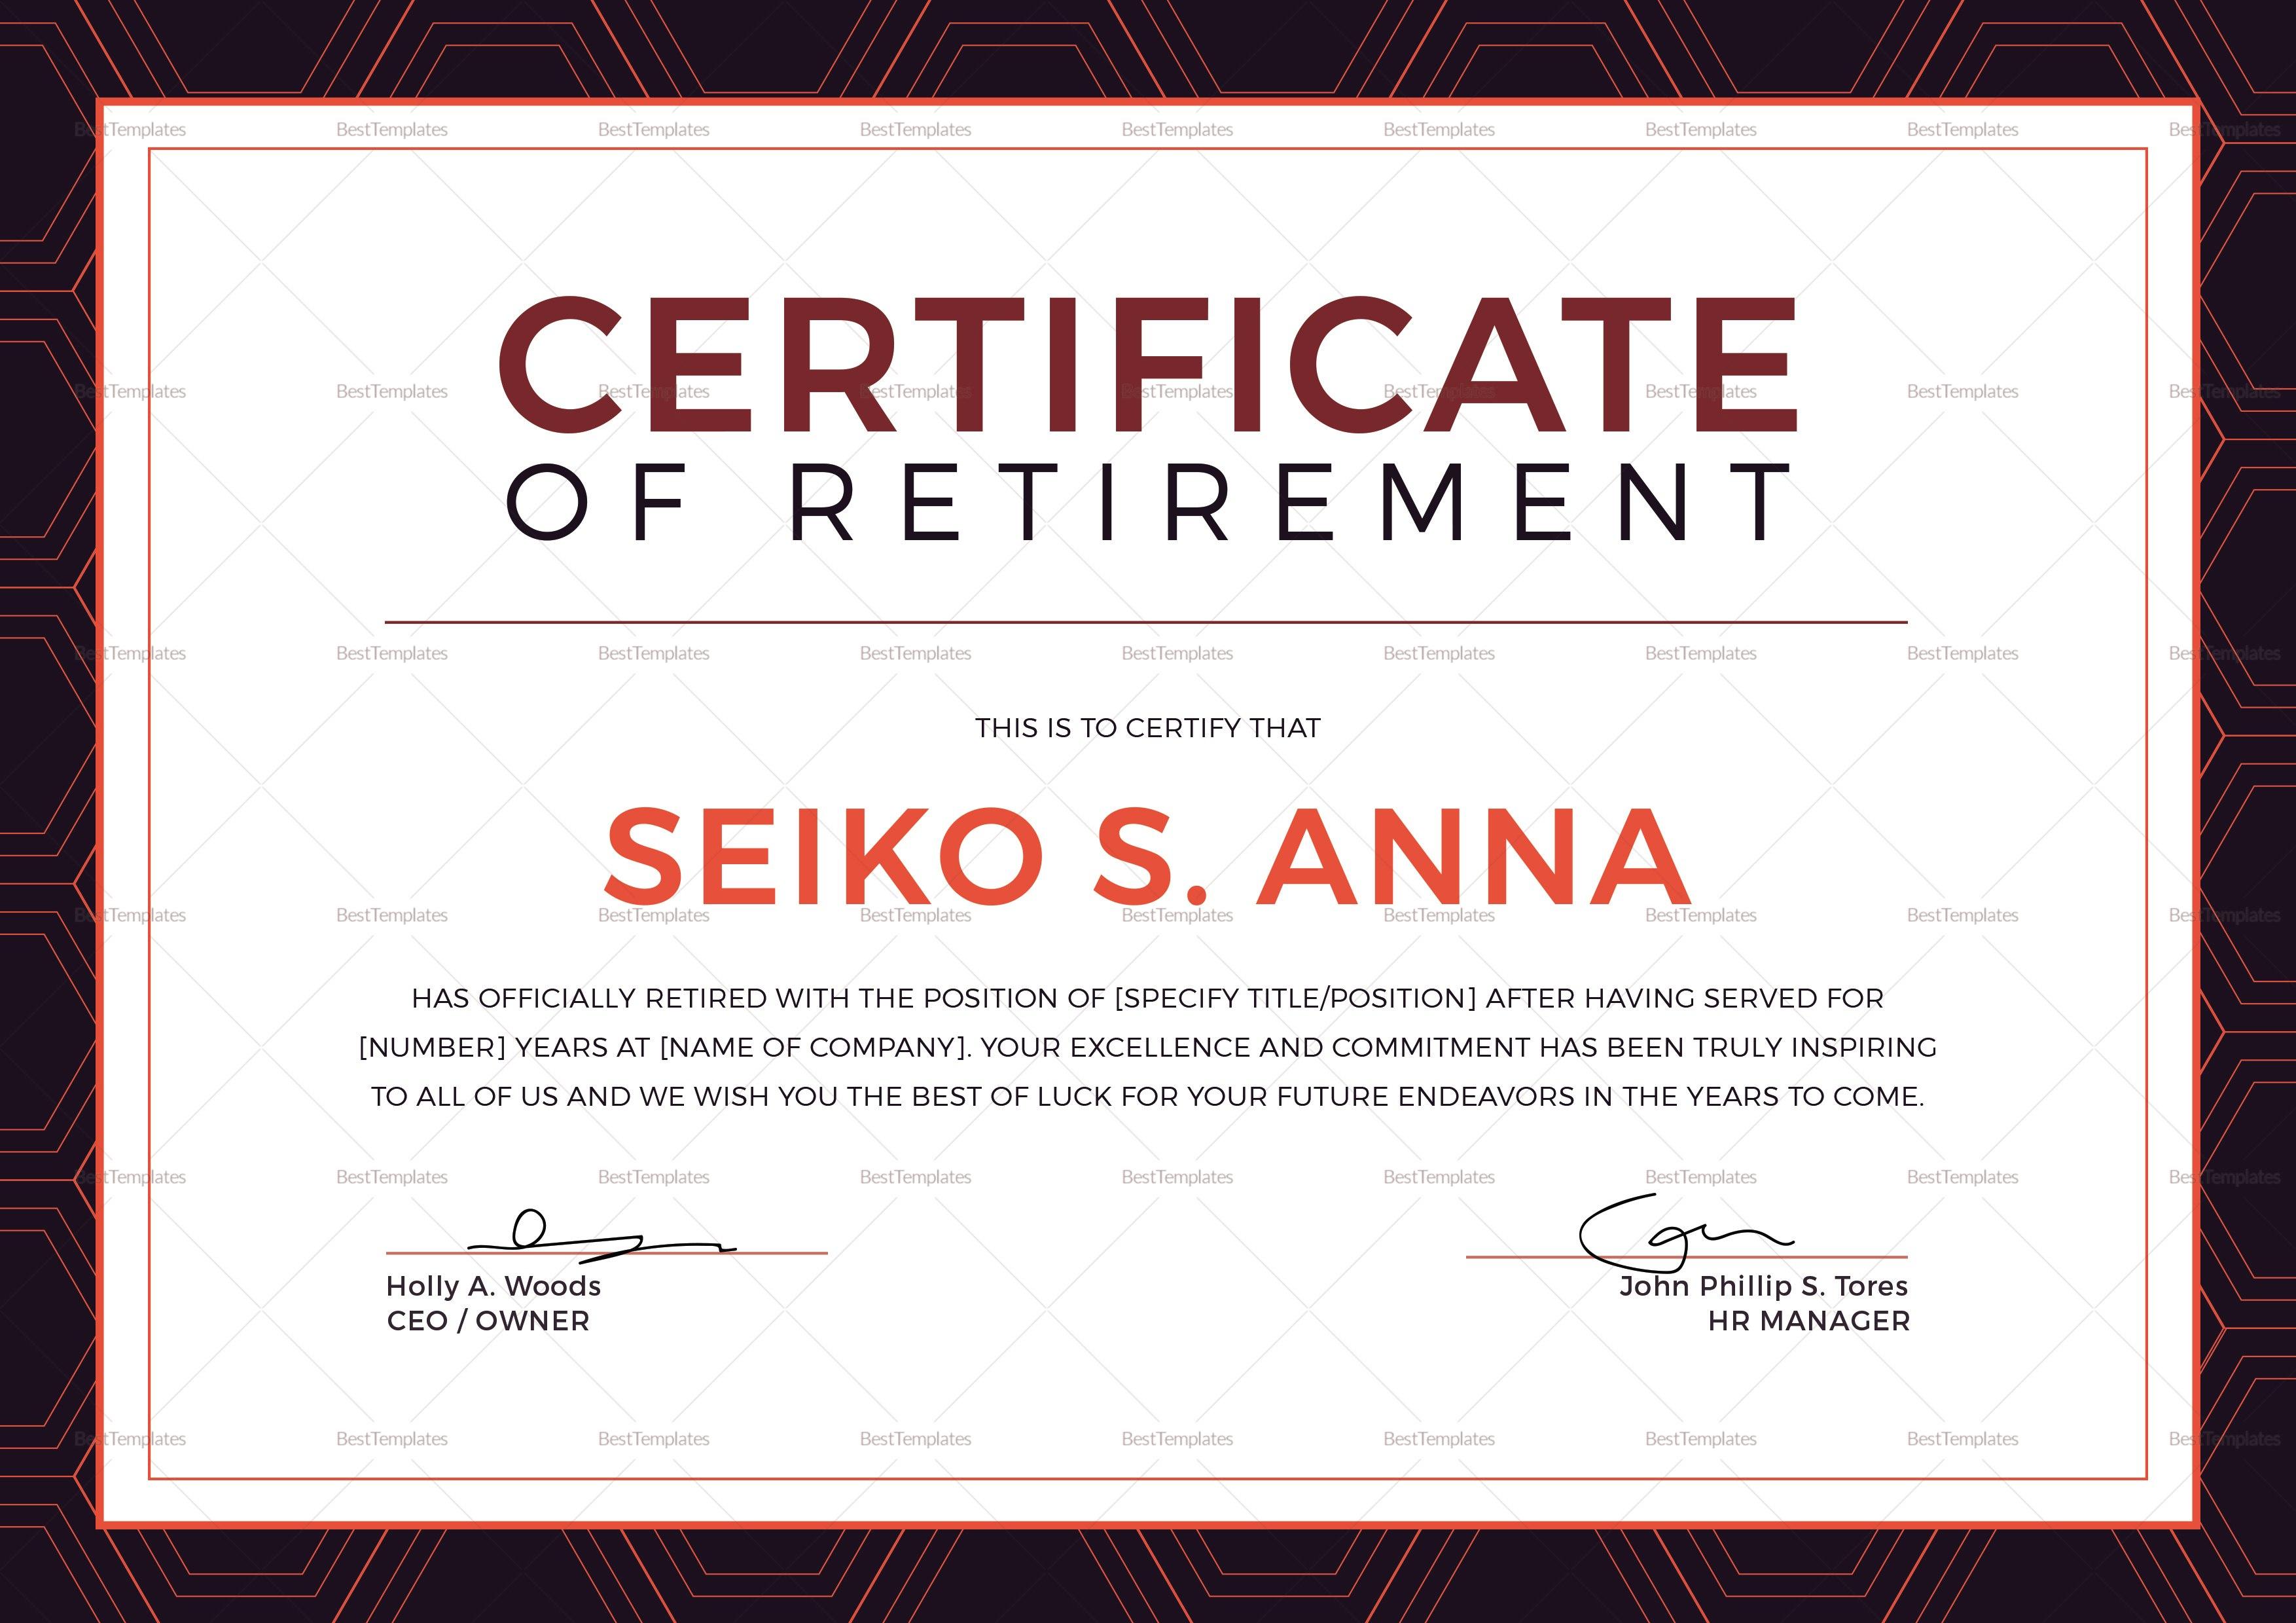 Retirement Certificate Design Template In Psd Word Publisher Intended For Retirement Certificate Template